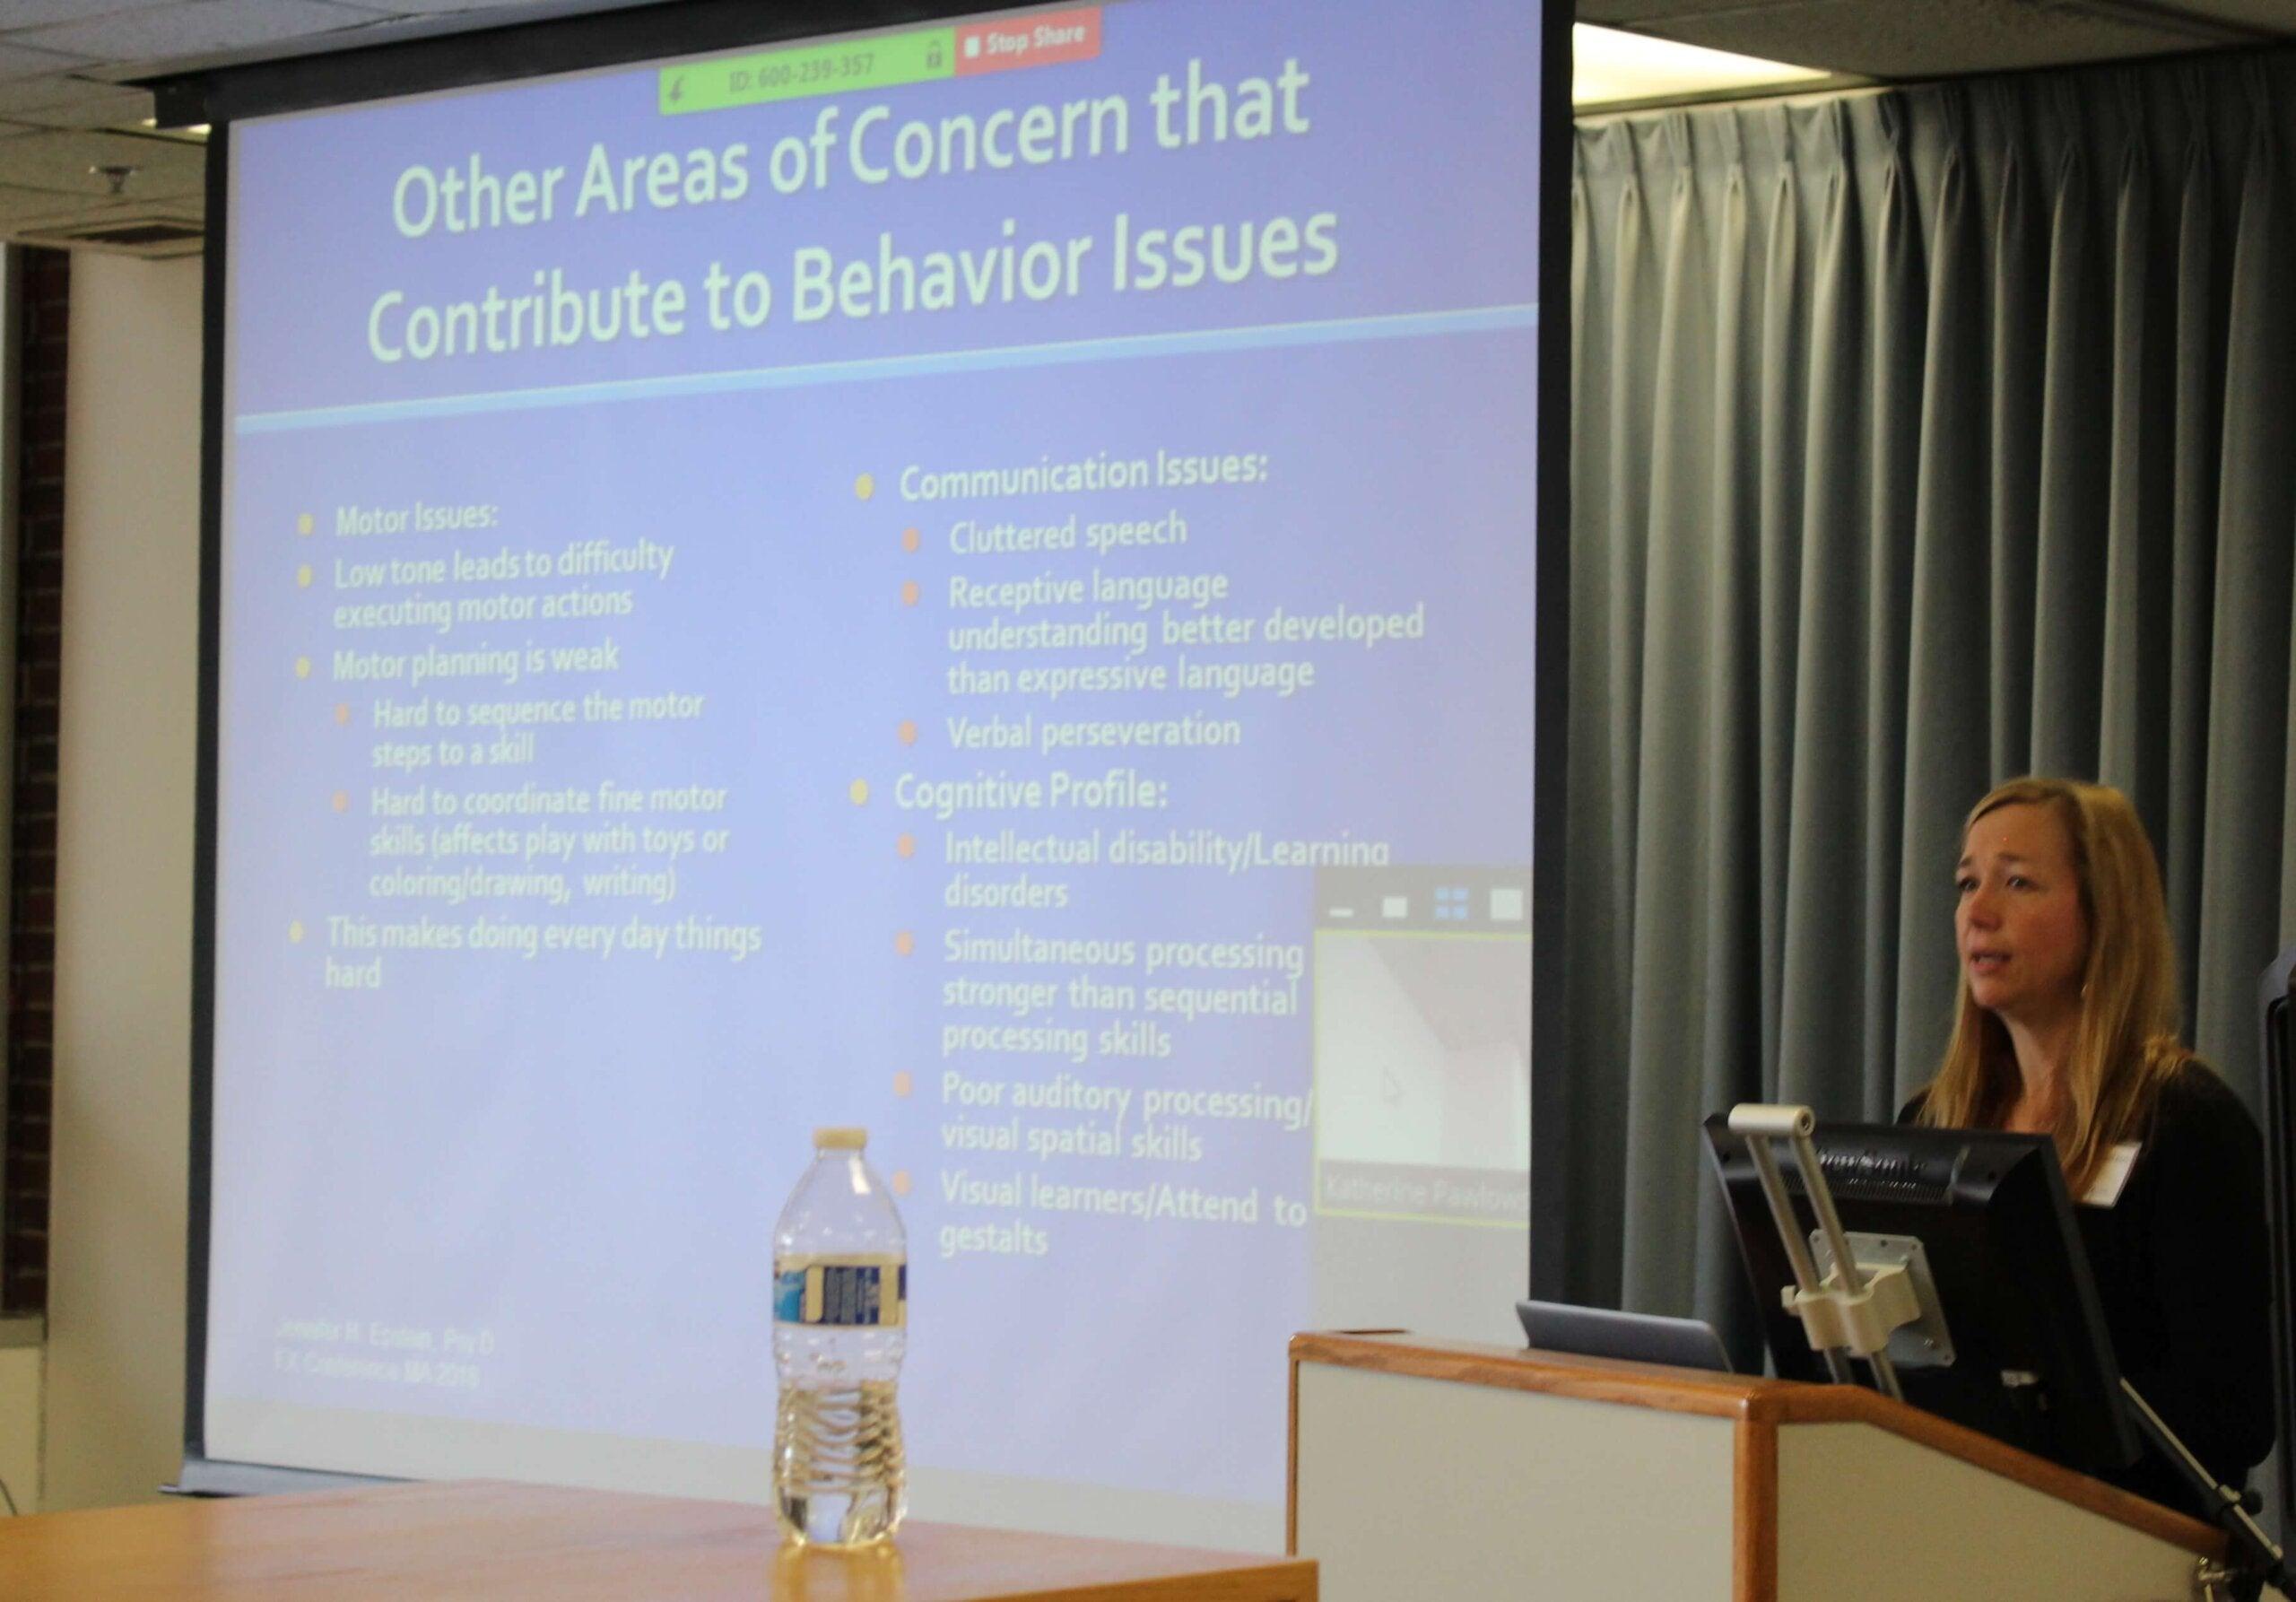 Behavior talk at Boston conference